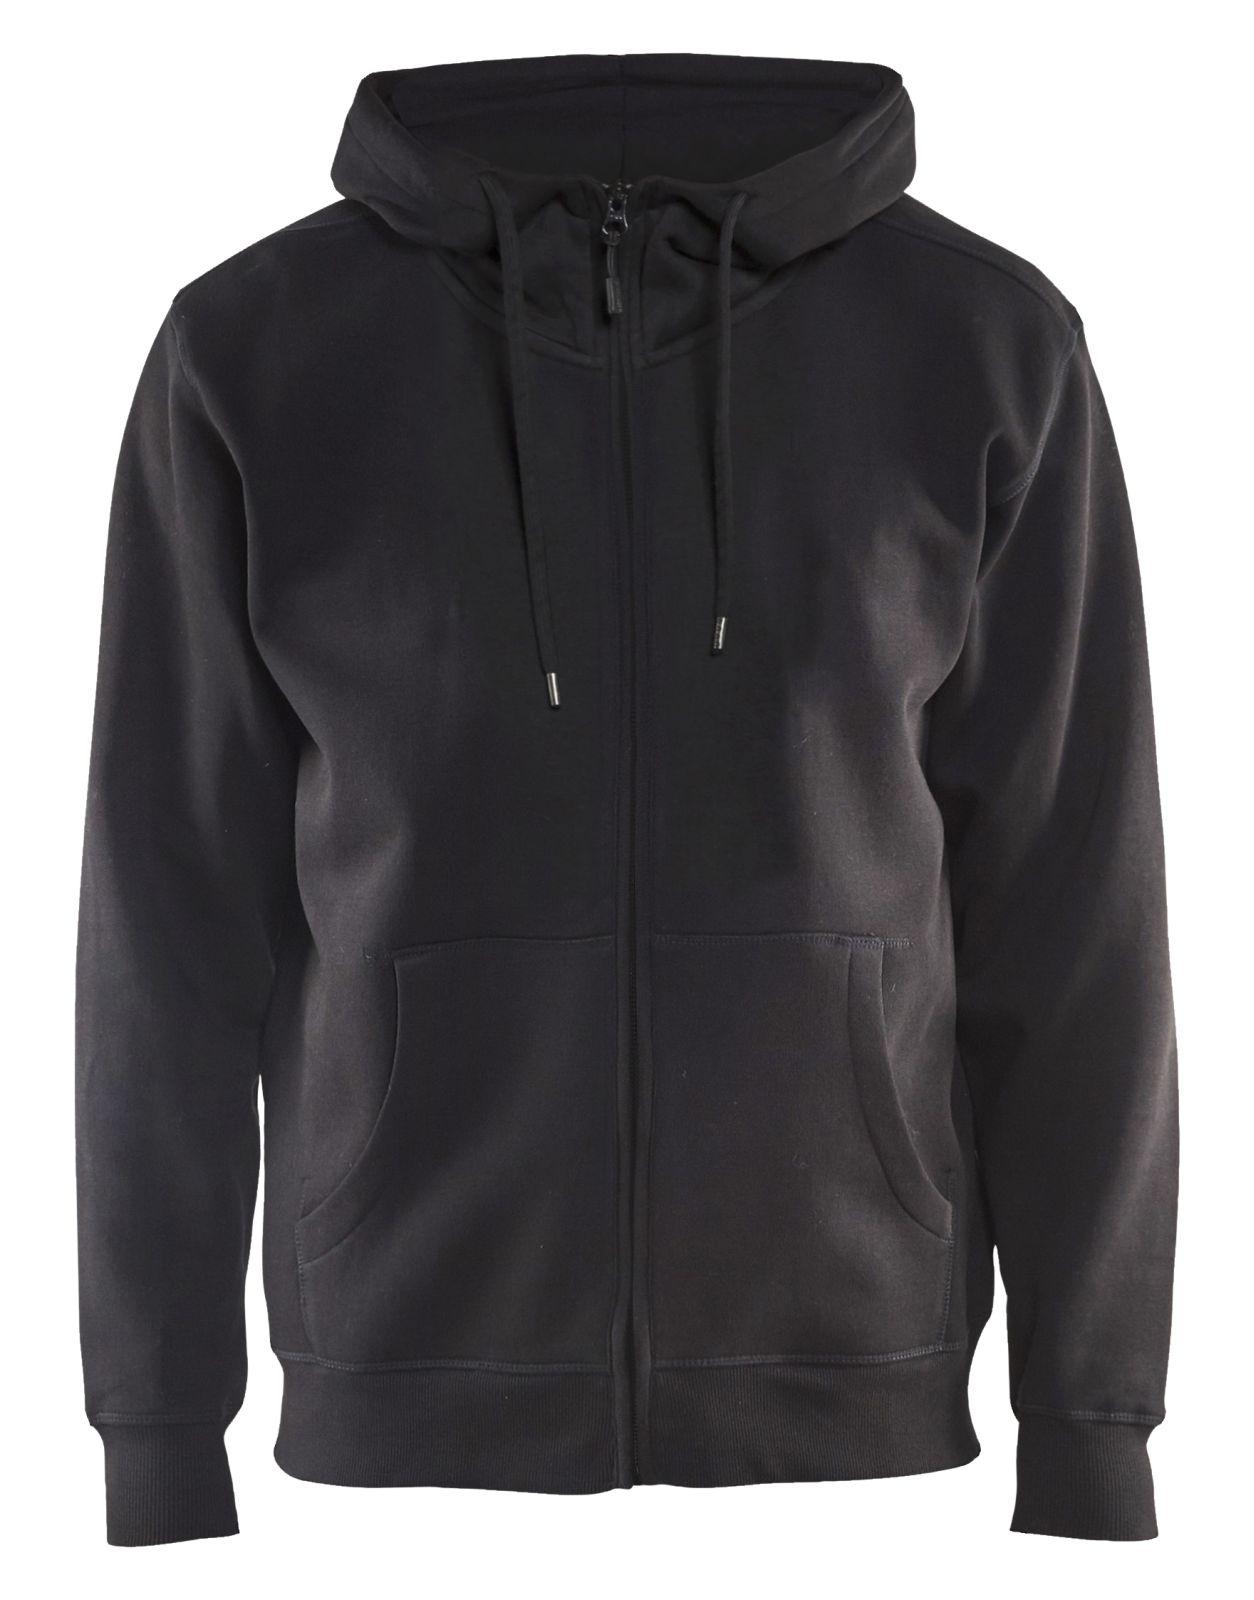 Blaklader Hooded sweatvesten 33661048 zwart(9900)